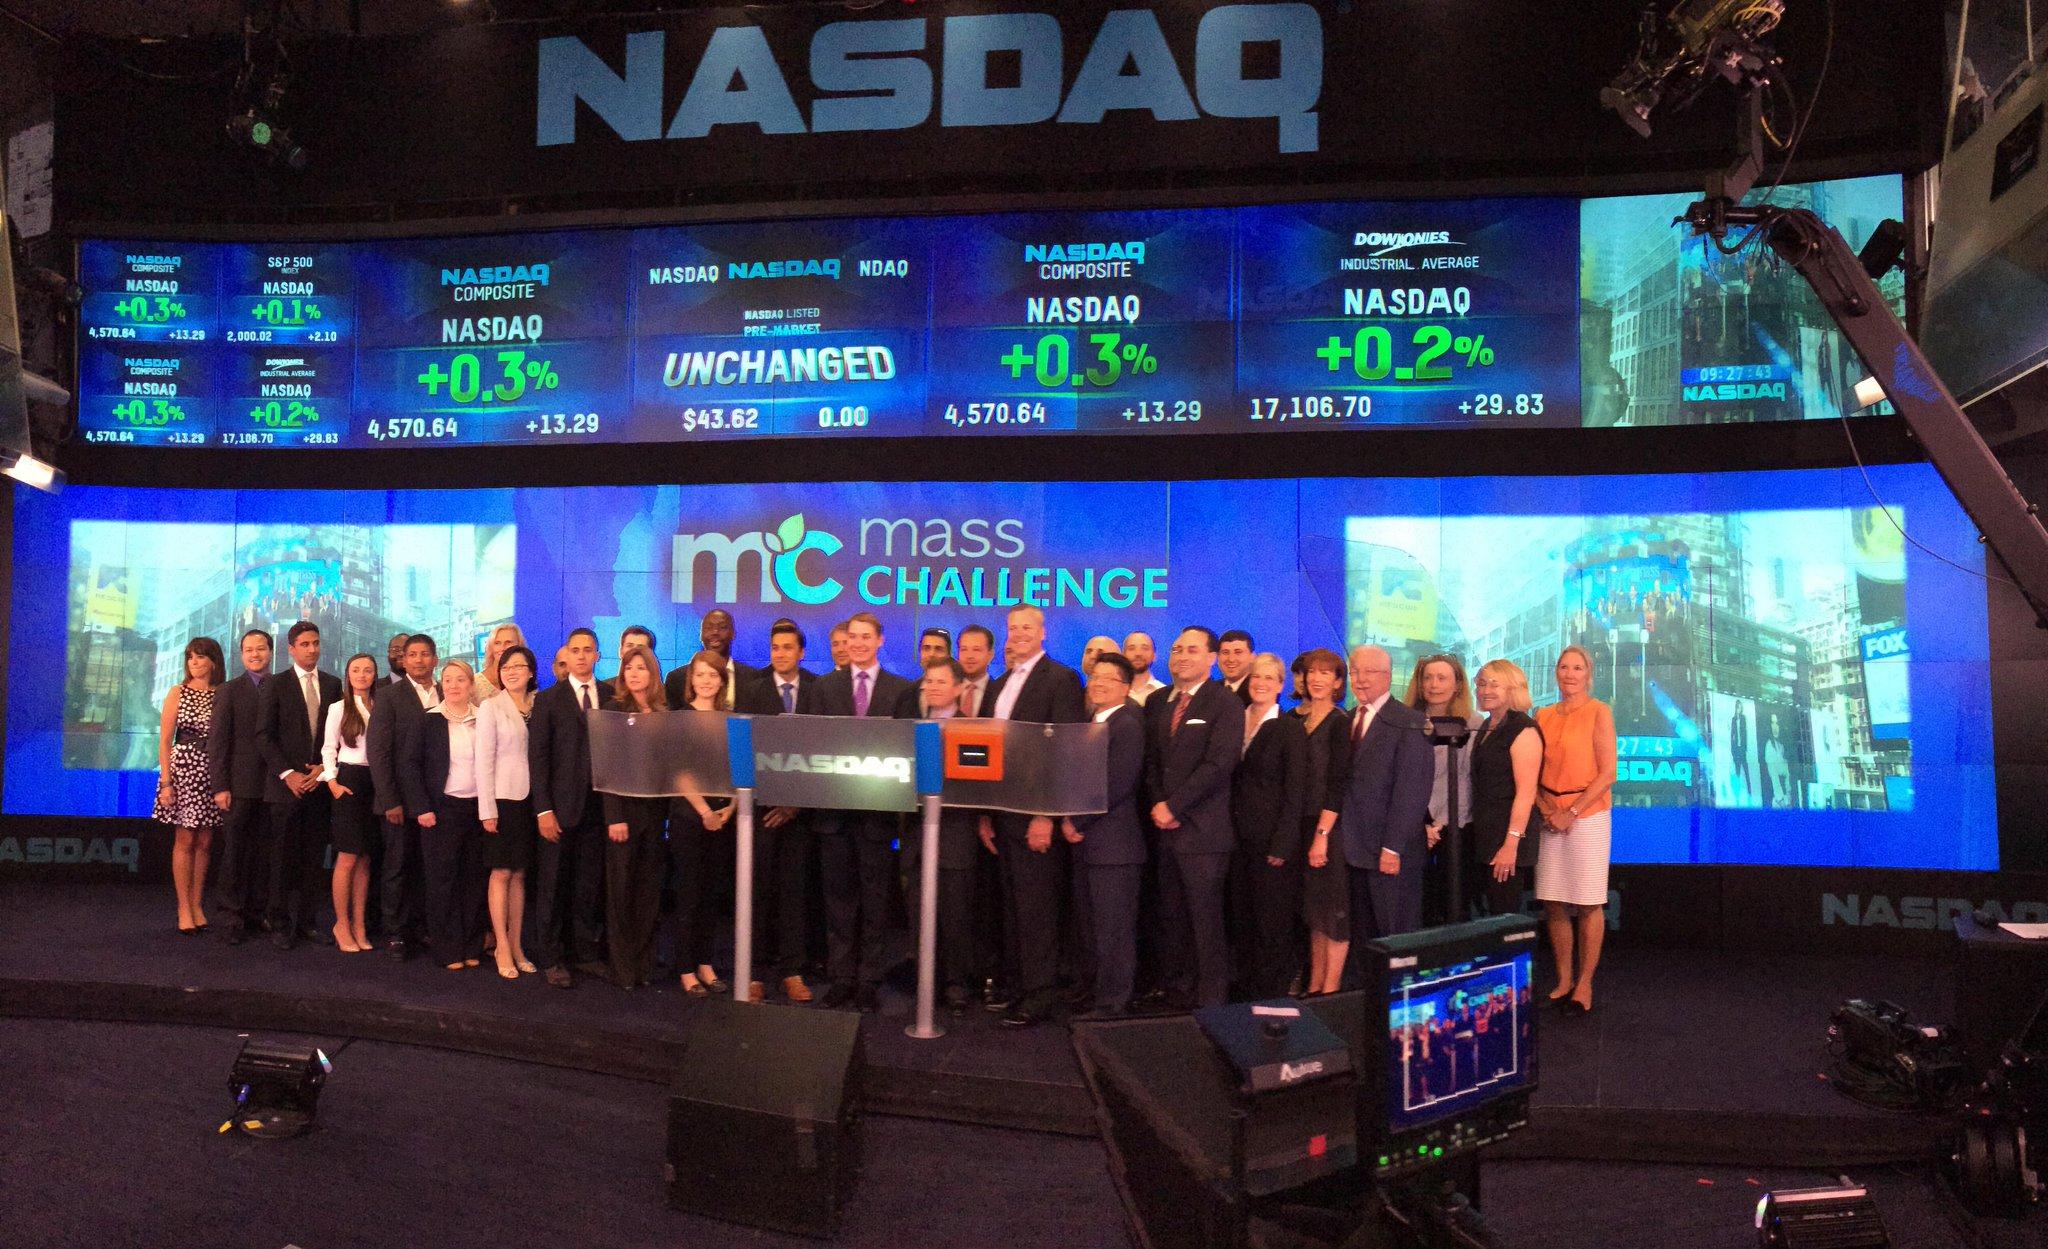 RT @NASDAQOMX: .@MassChallenge rings the #NASDAQ Opening Bell! http://t.co/1diGPy1PpV